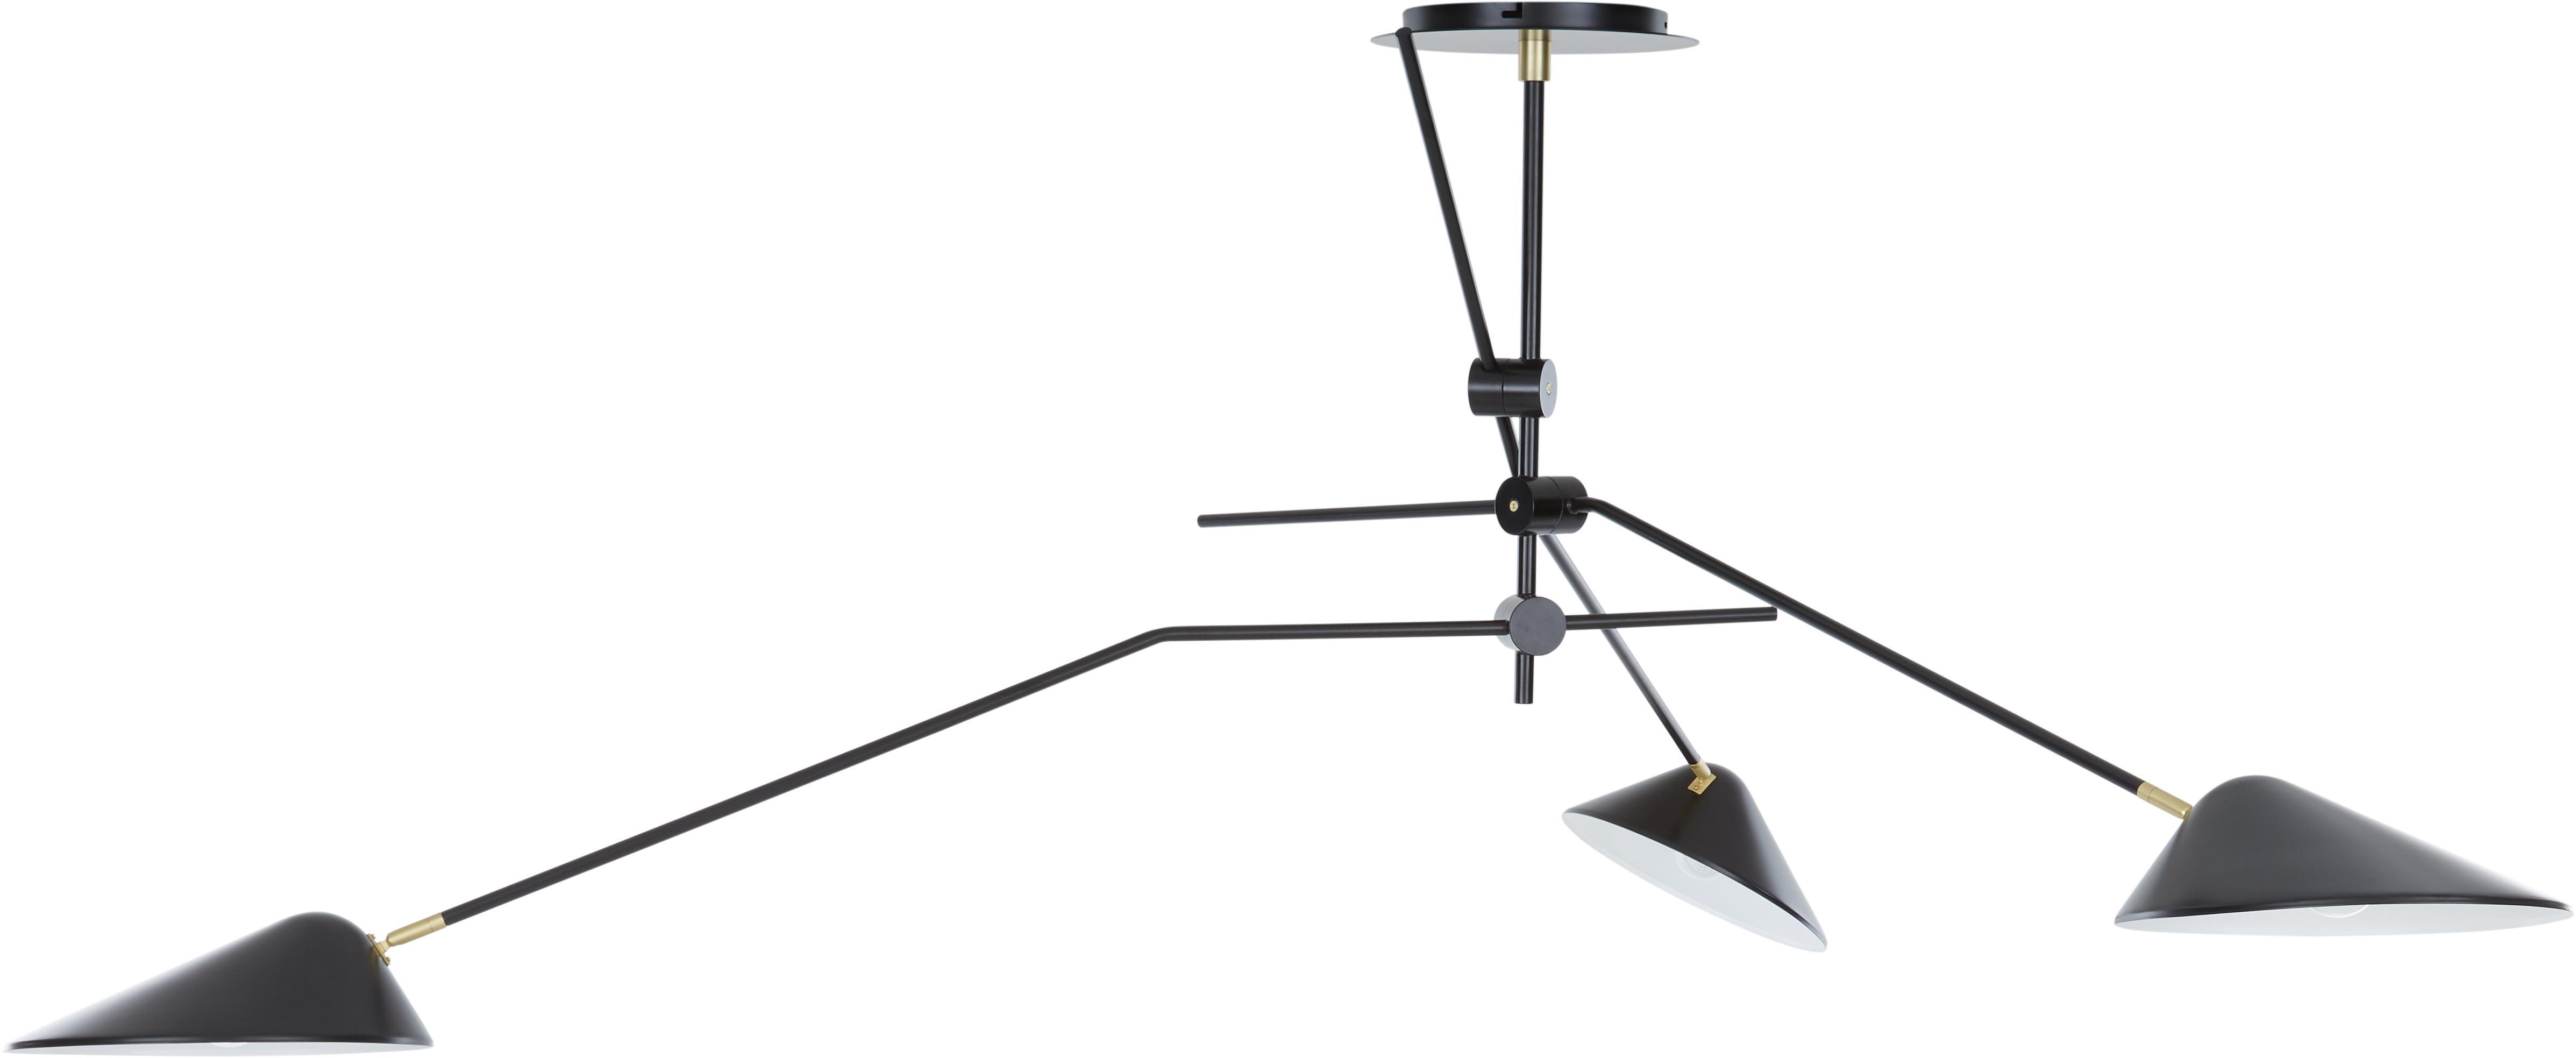 Lampada a sospensione Neron, Paralume: metallo verniciato a polv, Baldacchino: metallo verniciato a polv, Nero, Larg. 173 x Alt. 52 cm